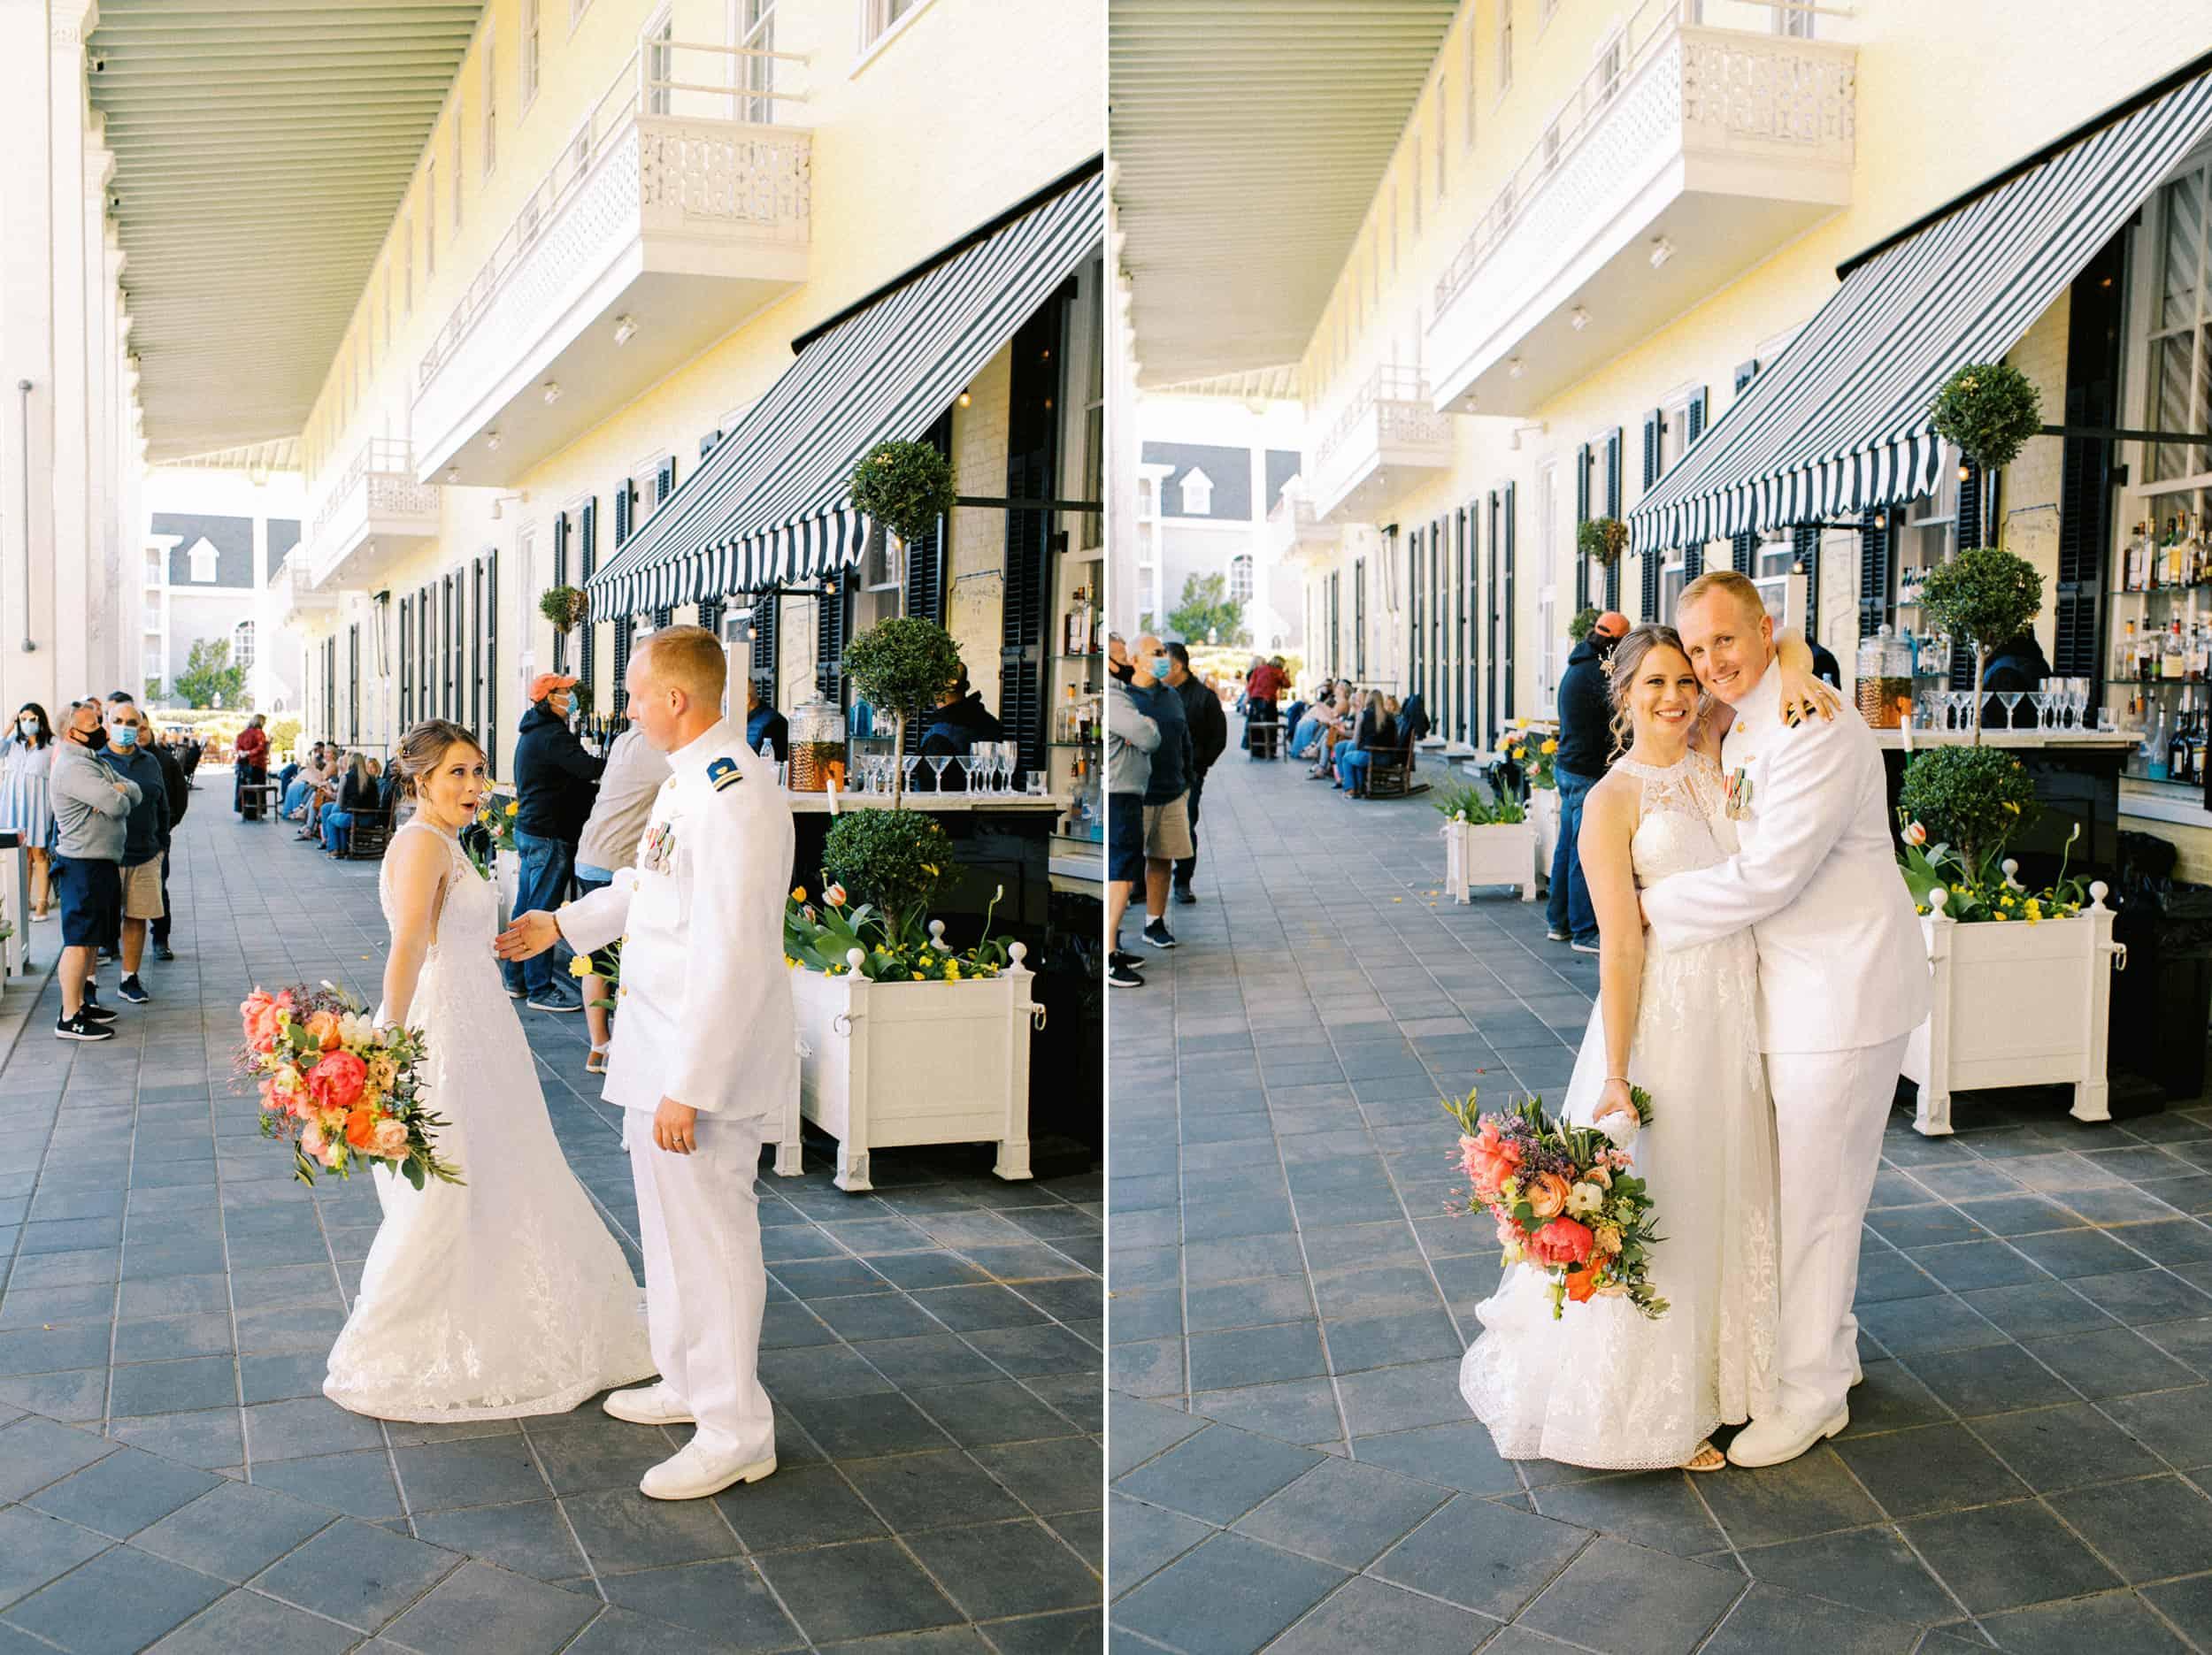 weddings at Congress Hall